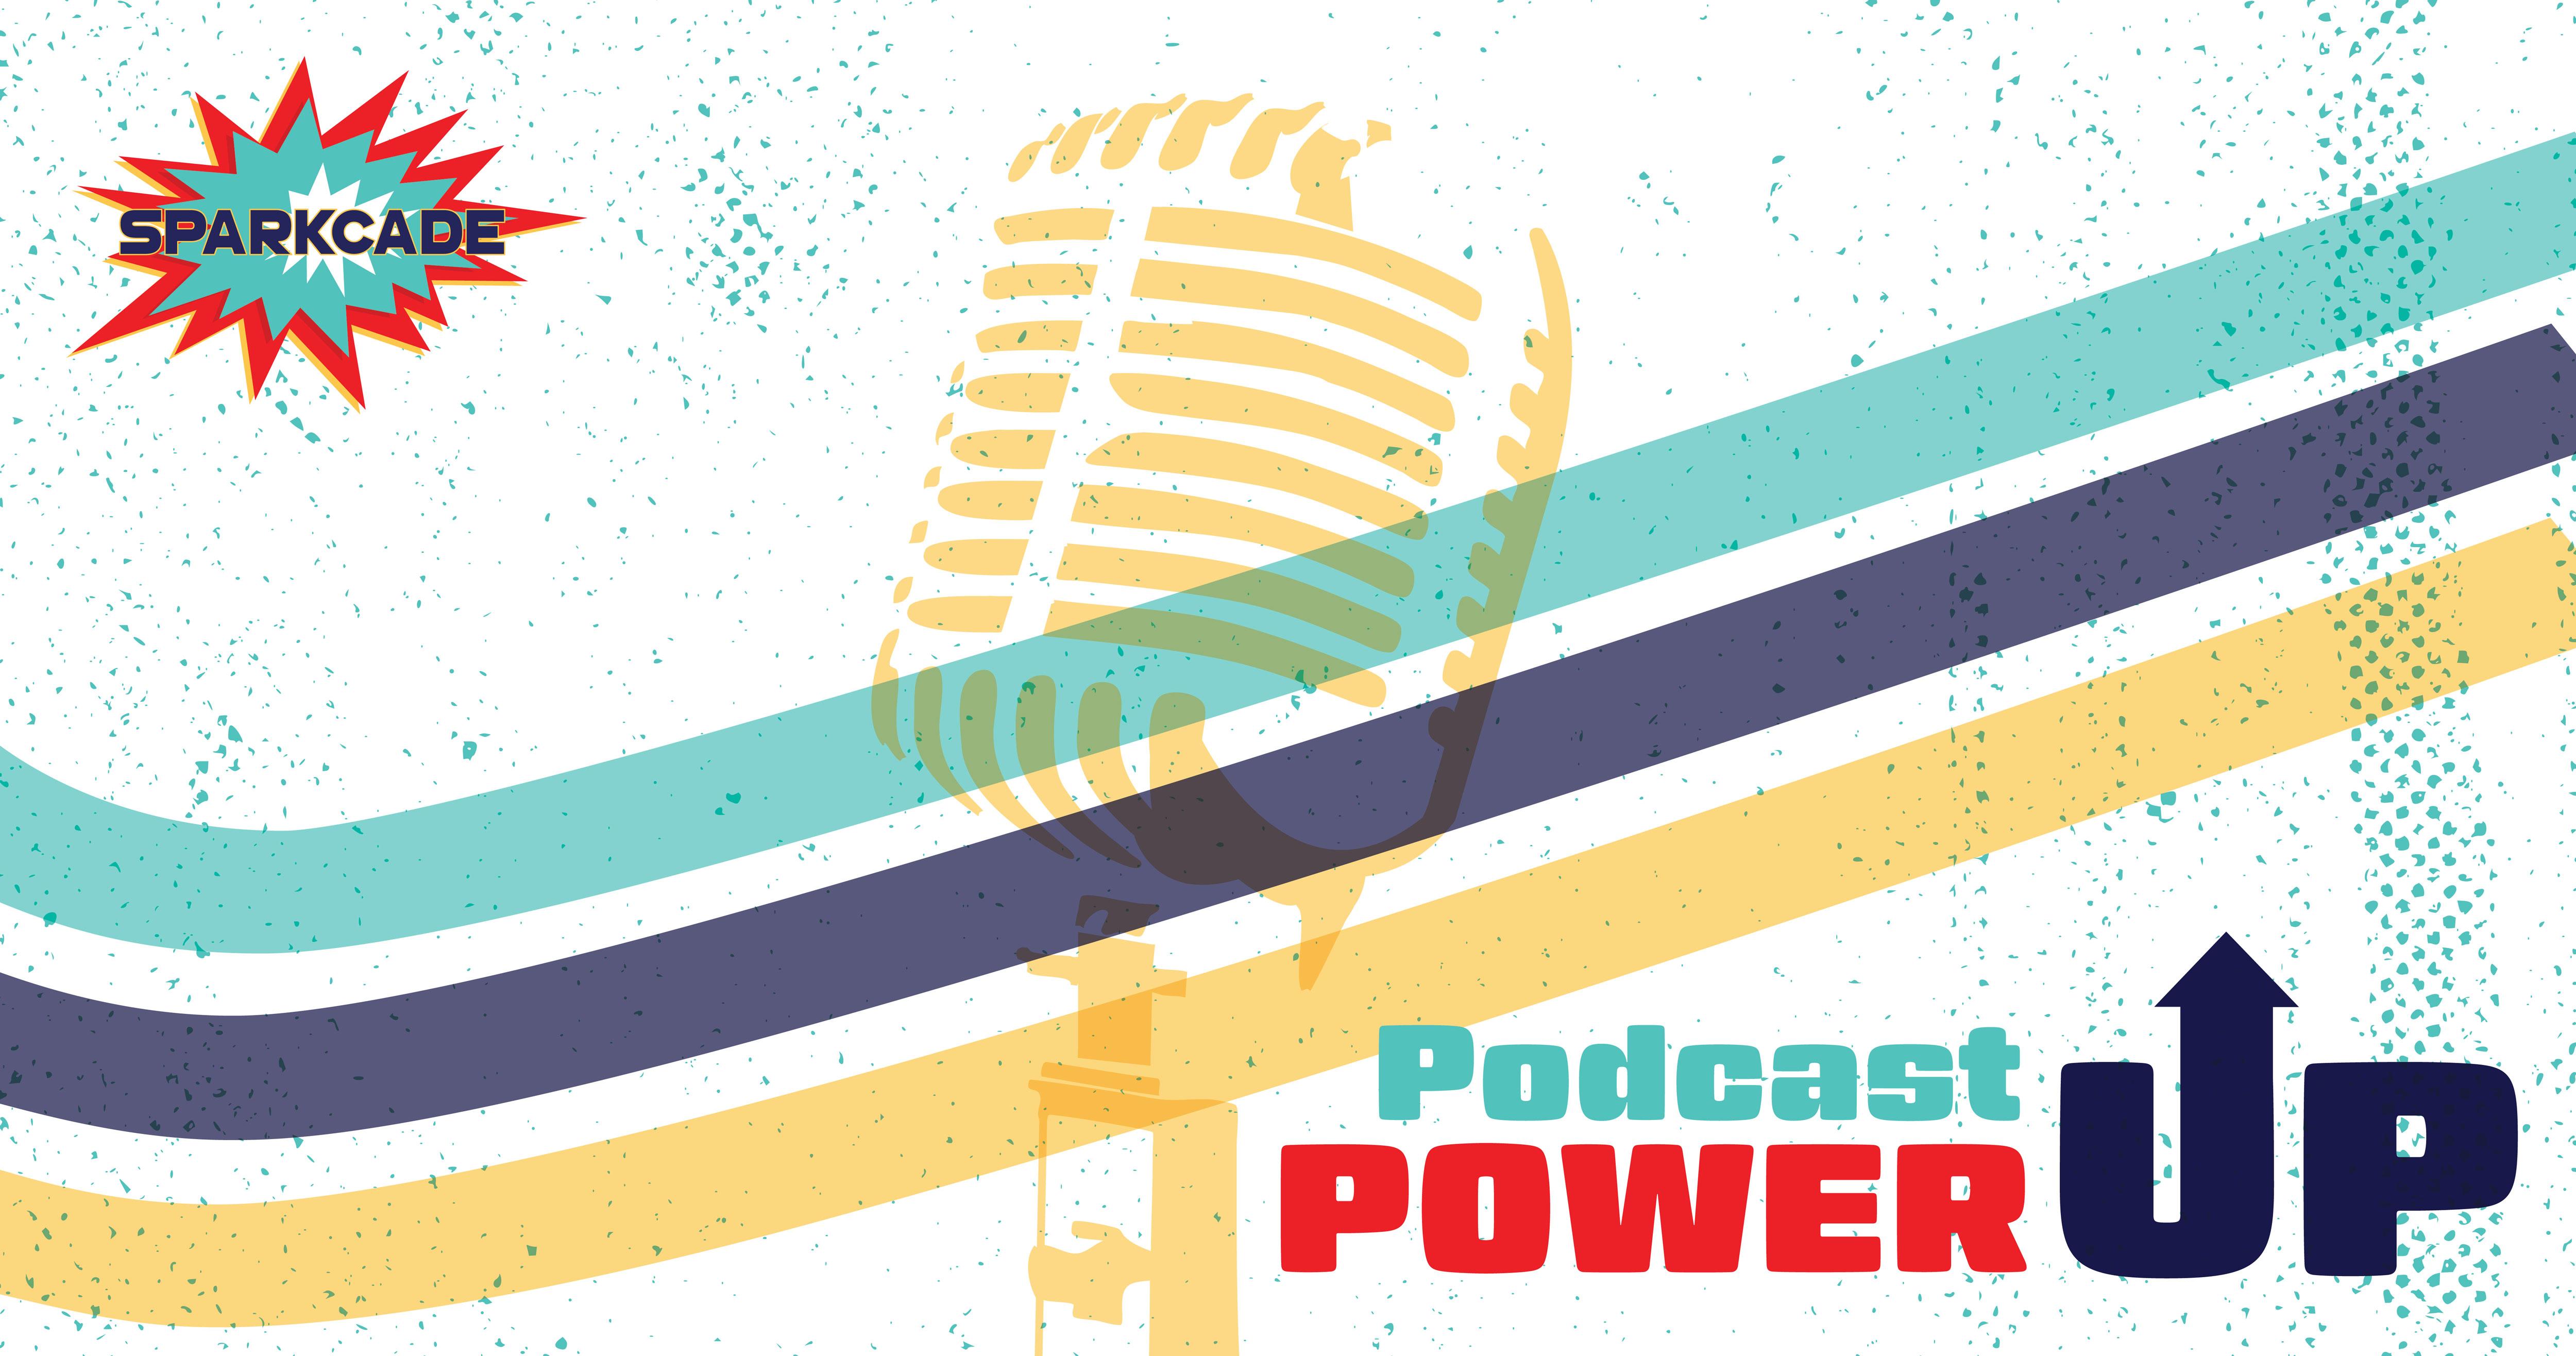 PodcastPowerUP_LPHero-01-web